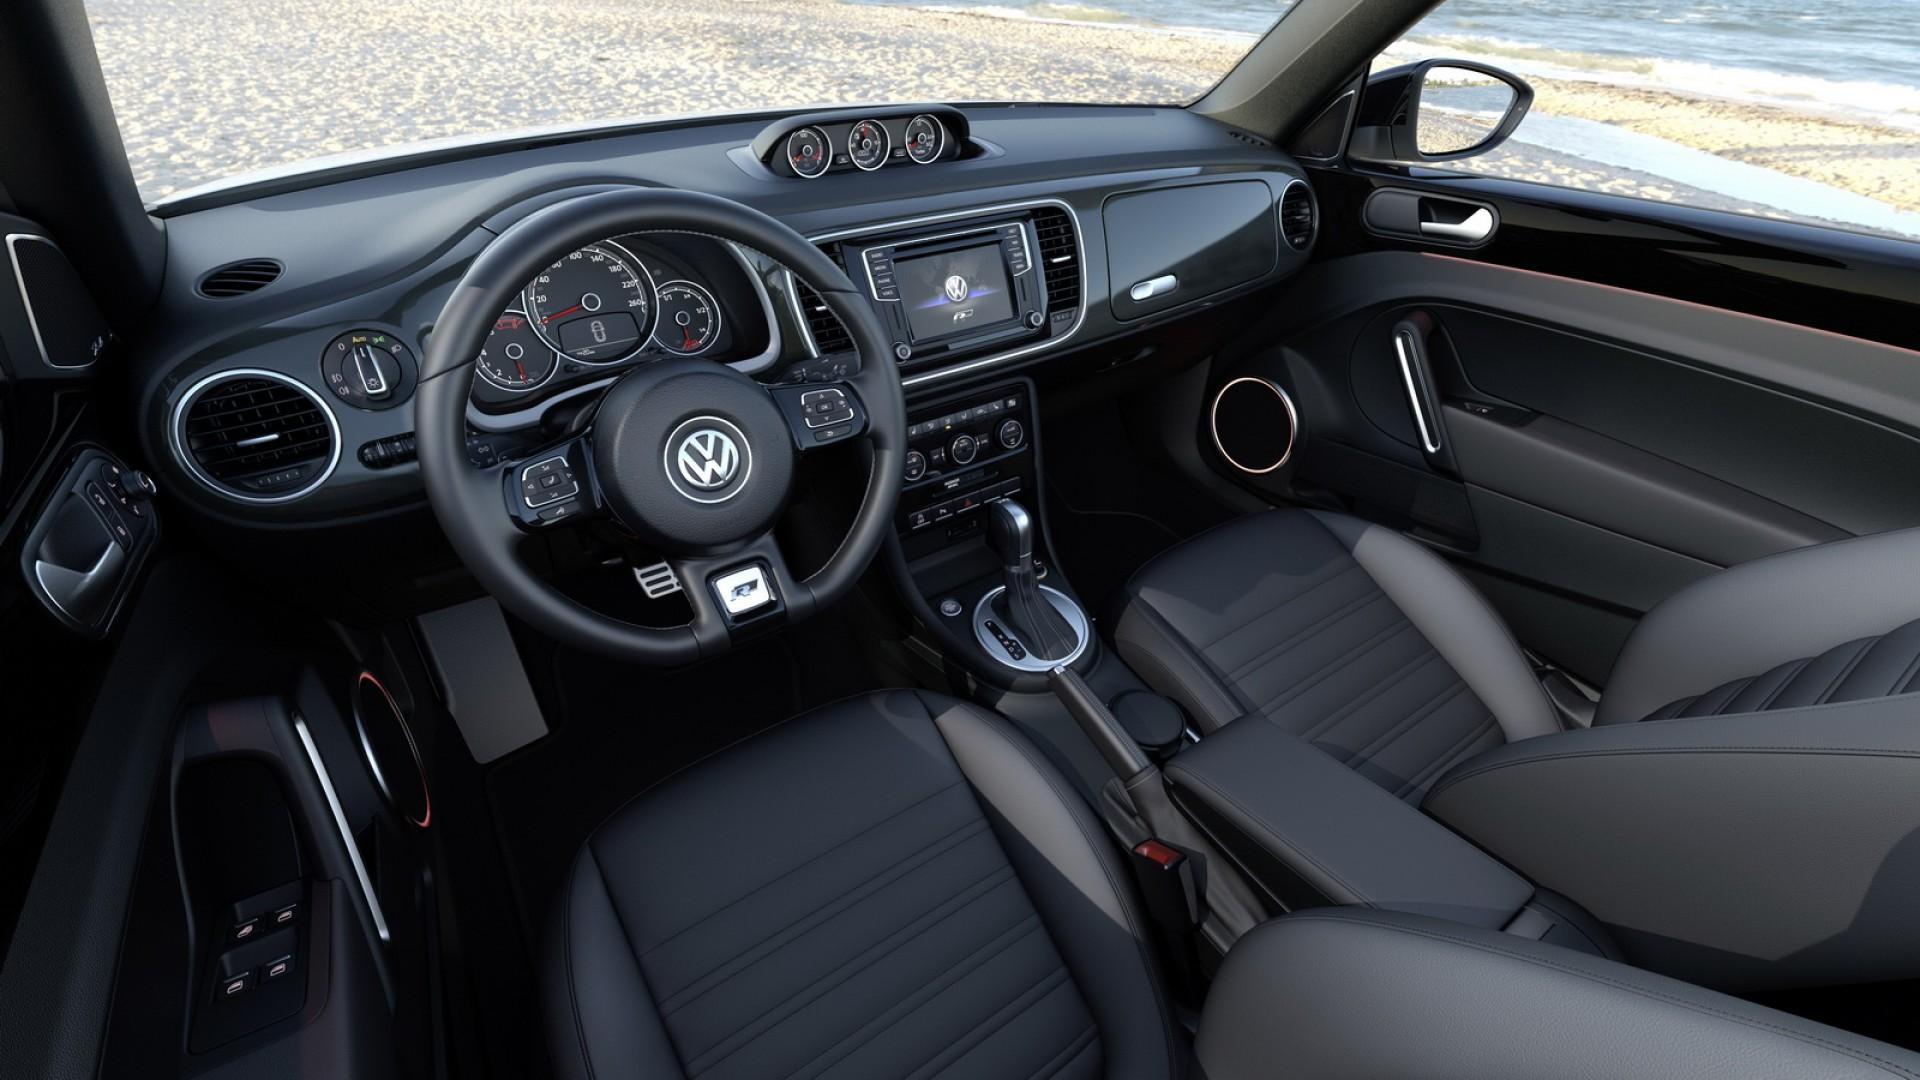 Sobre Volkswagen Fusca 2017 Volkswagen-atualiza-o-novo-fusca-para-a-linha-2017-veja-fotos